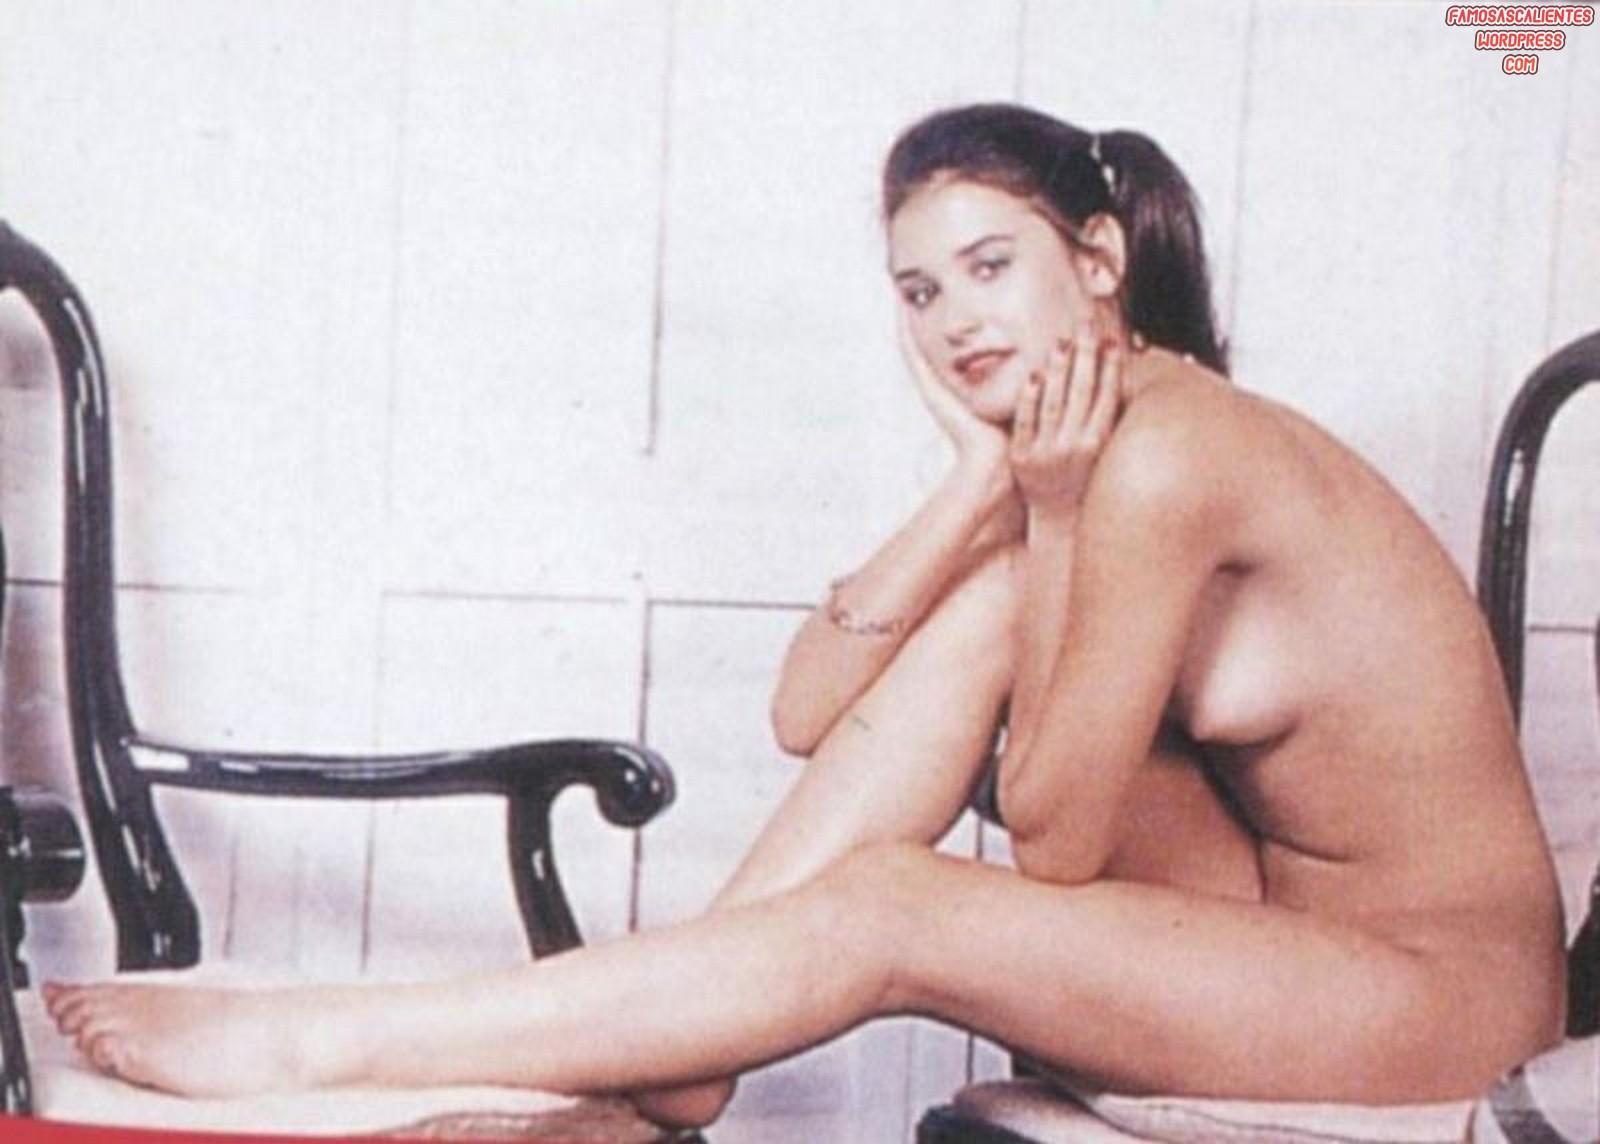 Nude girl body painting photo-7888